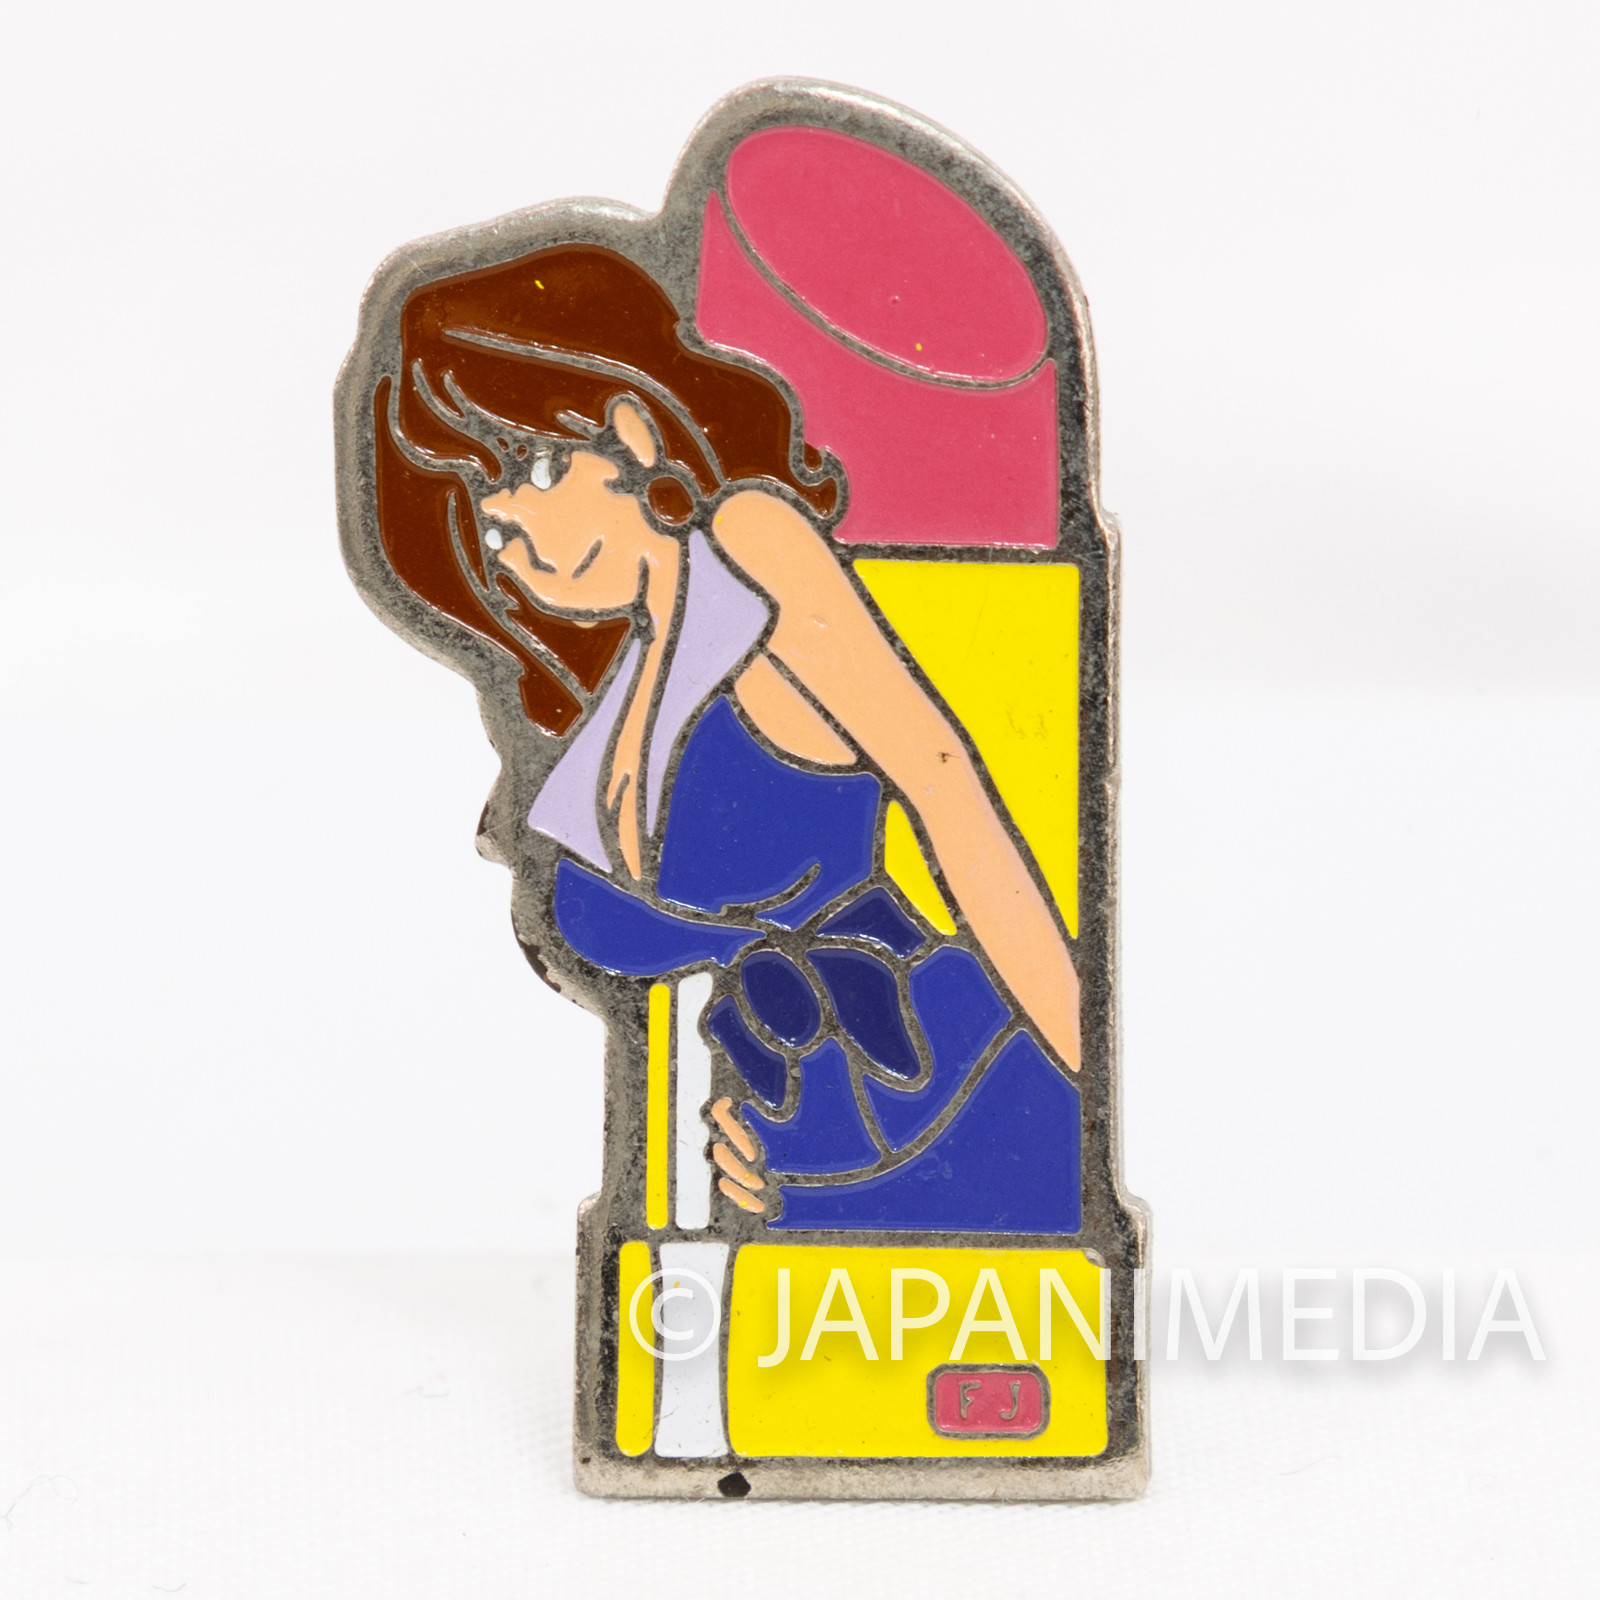 Lupin the Third (3rd) Fujiko Mine Metal Pins JAPAN ANIME 3